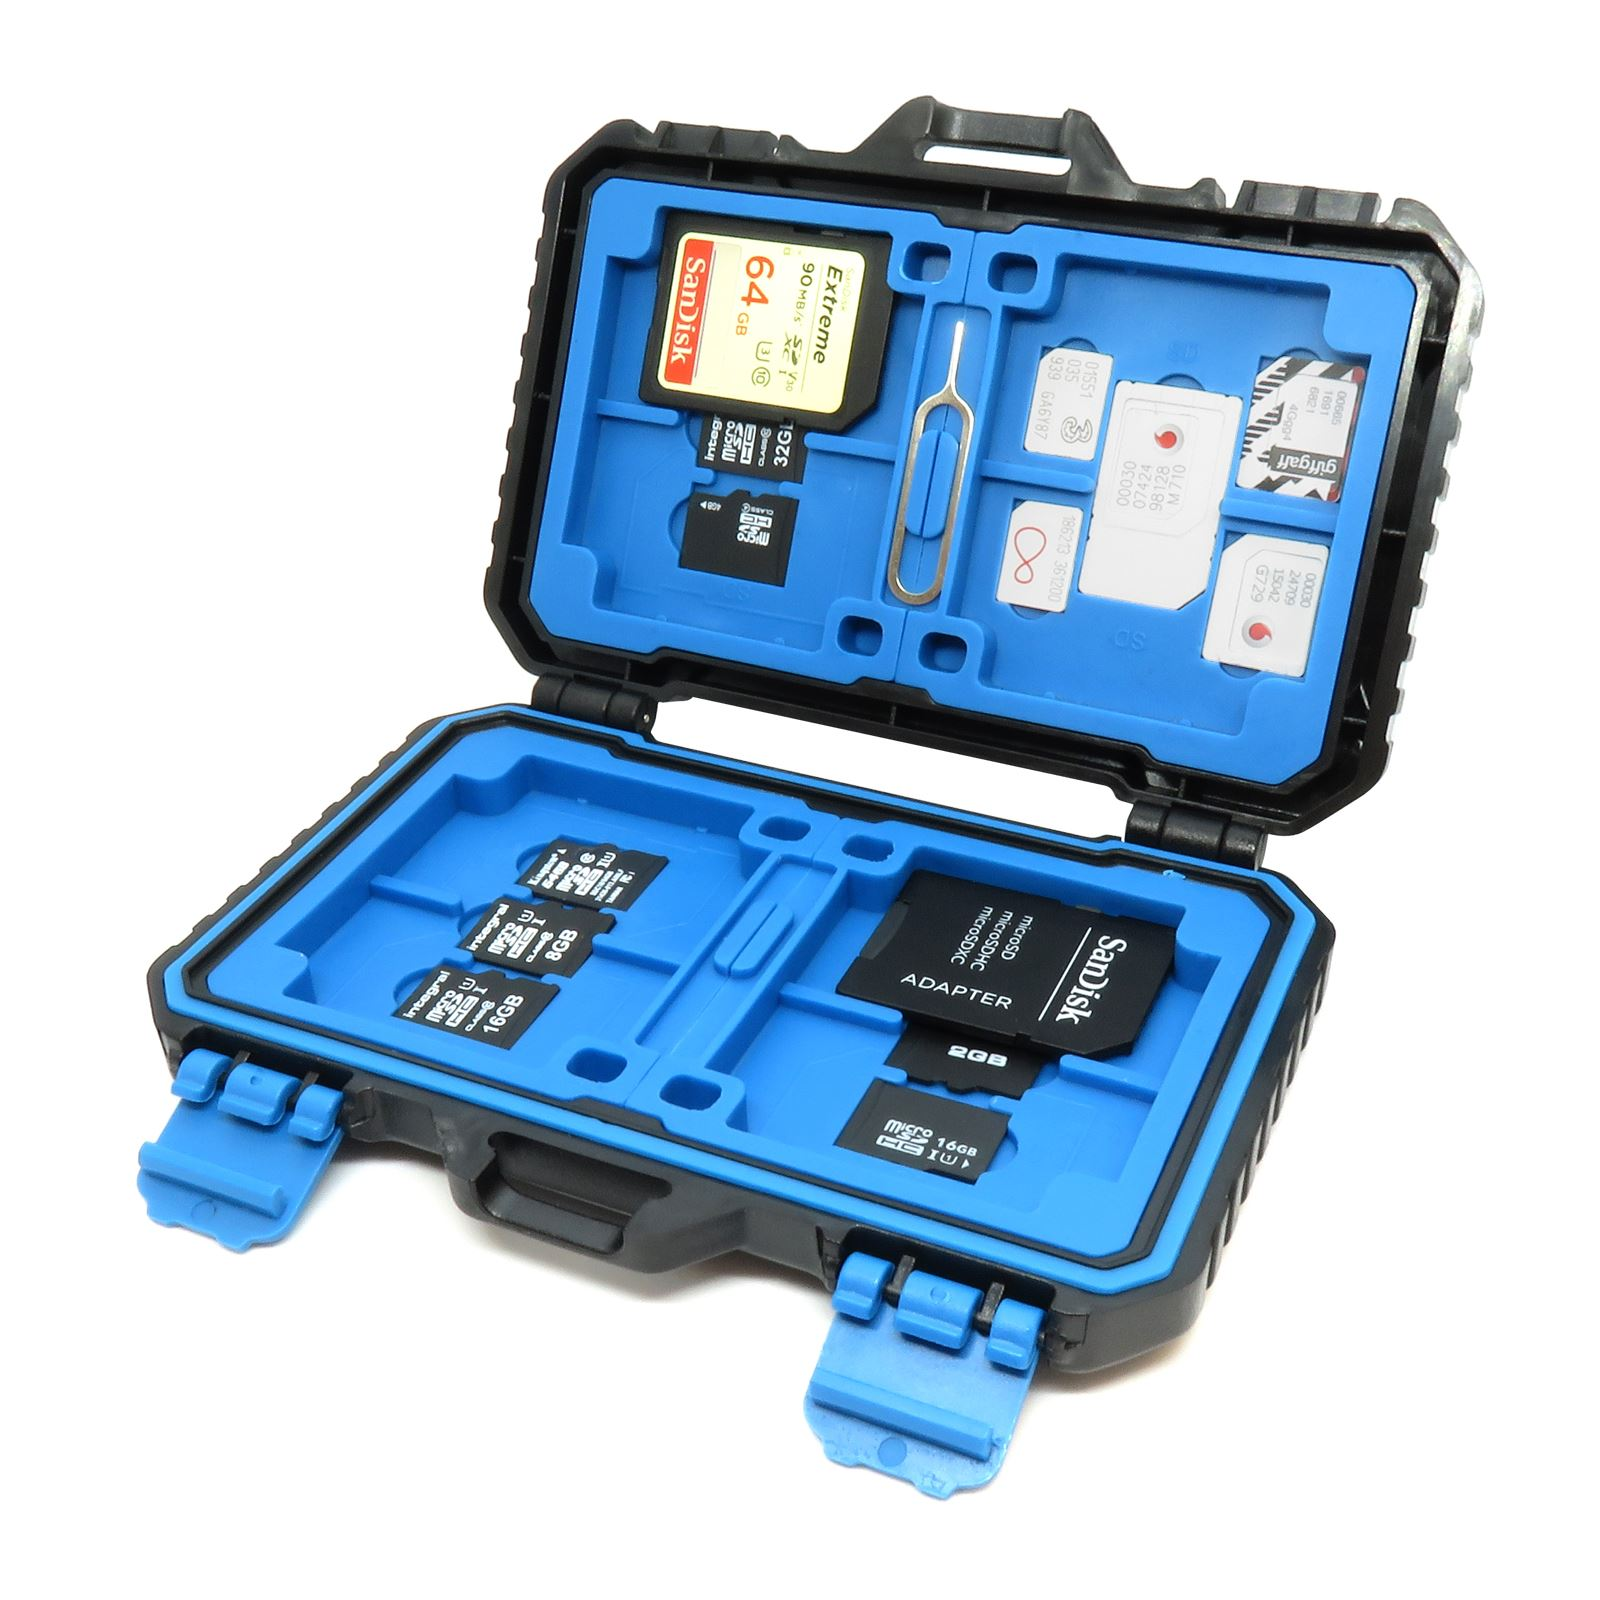 SD Micro SD CF SIM Card Storage Case Holder Portable Water Resistant Box upto 26